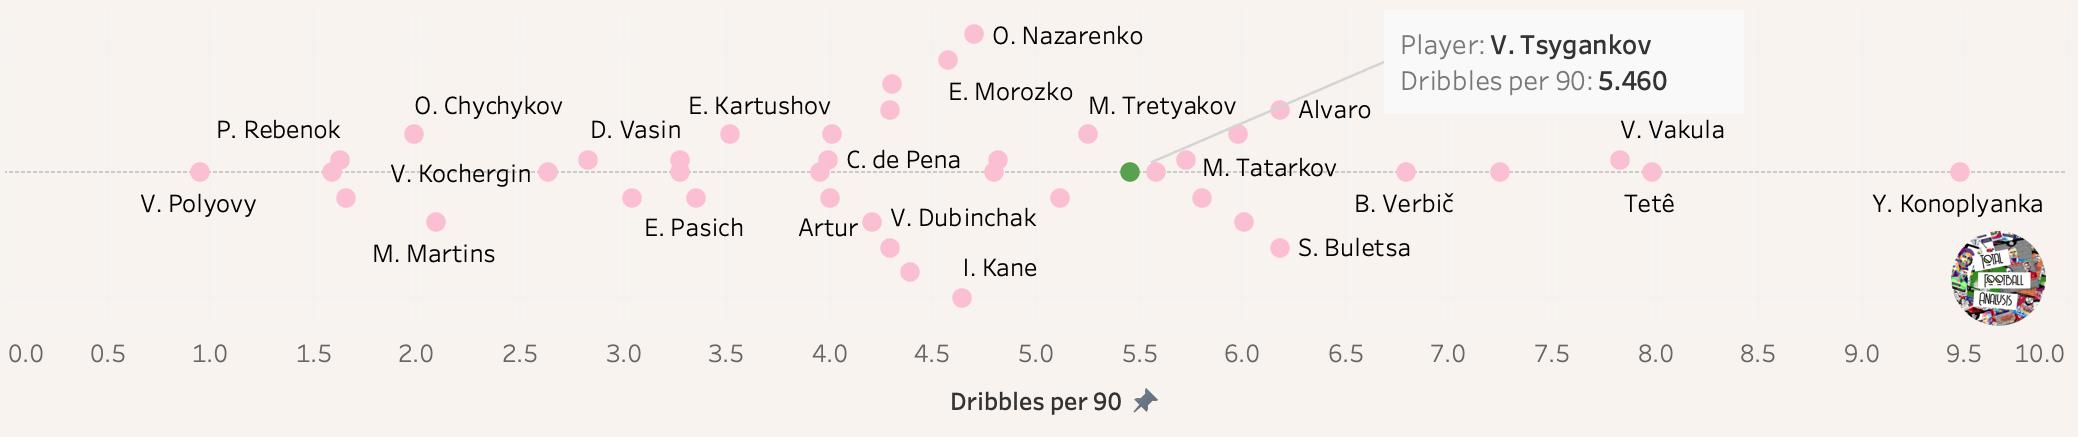 Viktor Tsygankov: Ready for a big move tactical analysis tactics